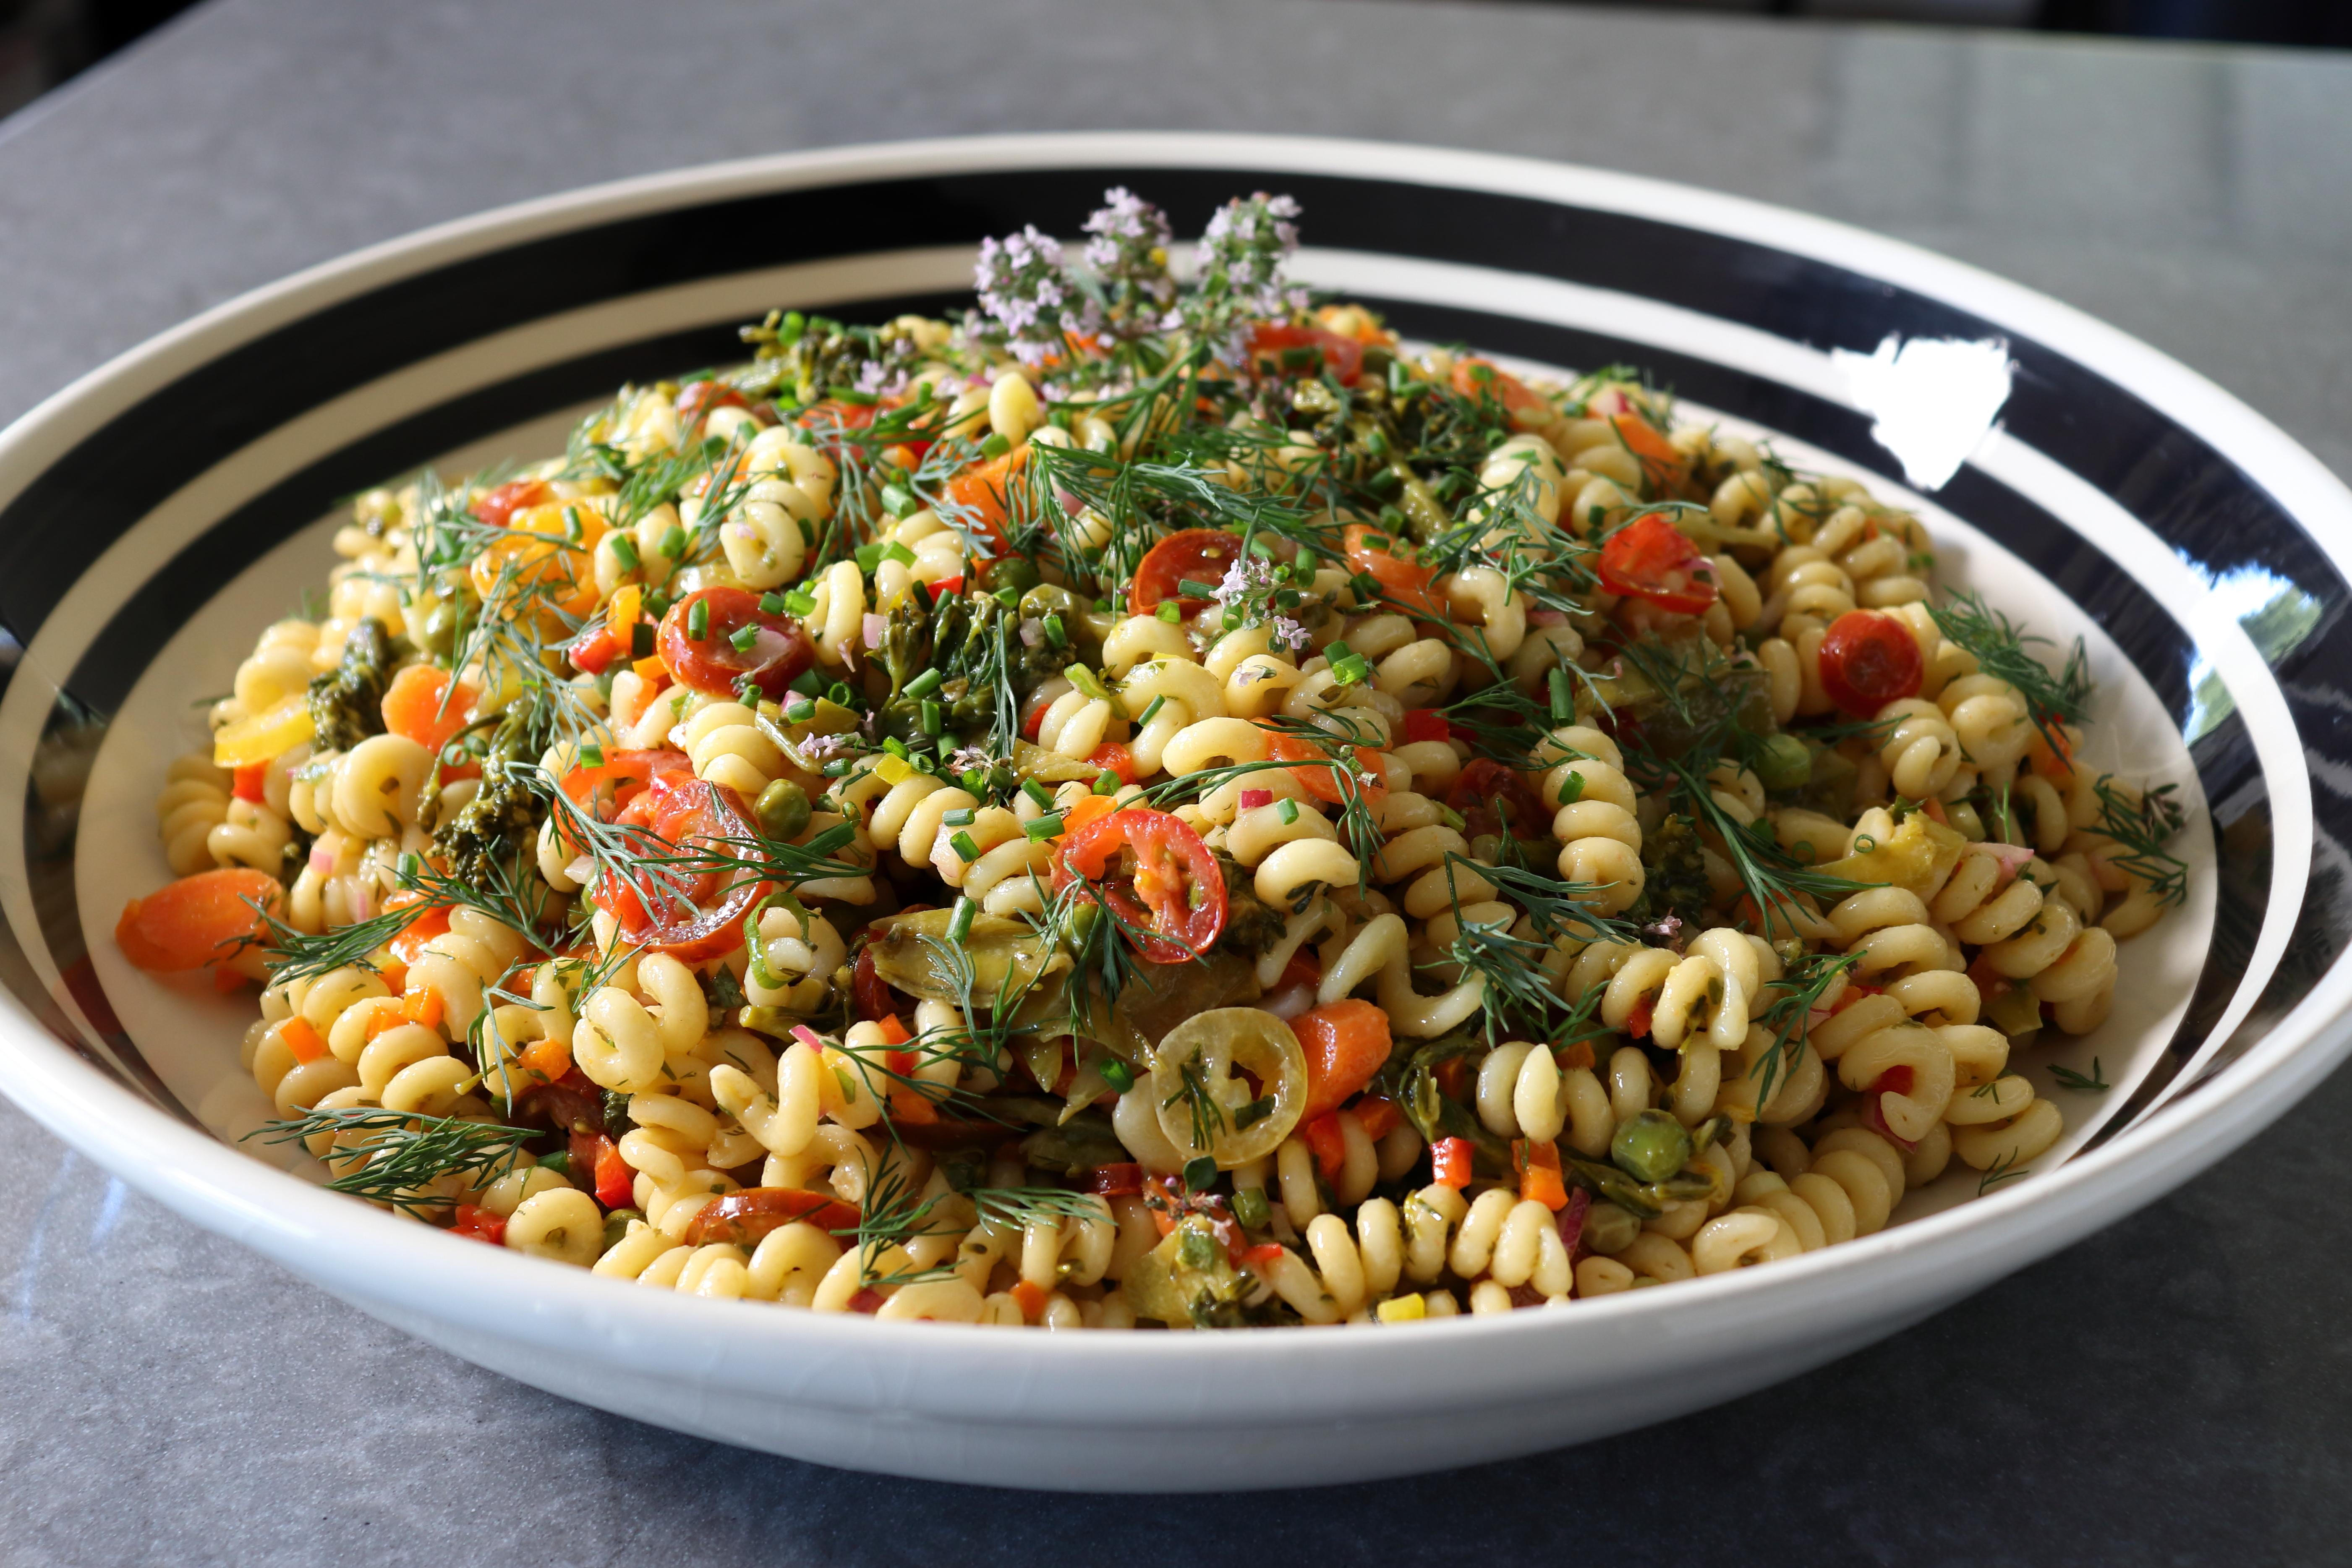 The Perfect Picnic Pasta Salad